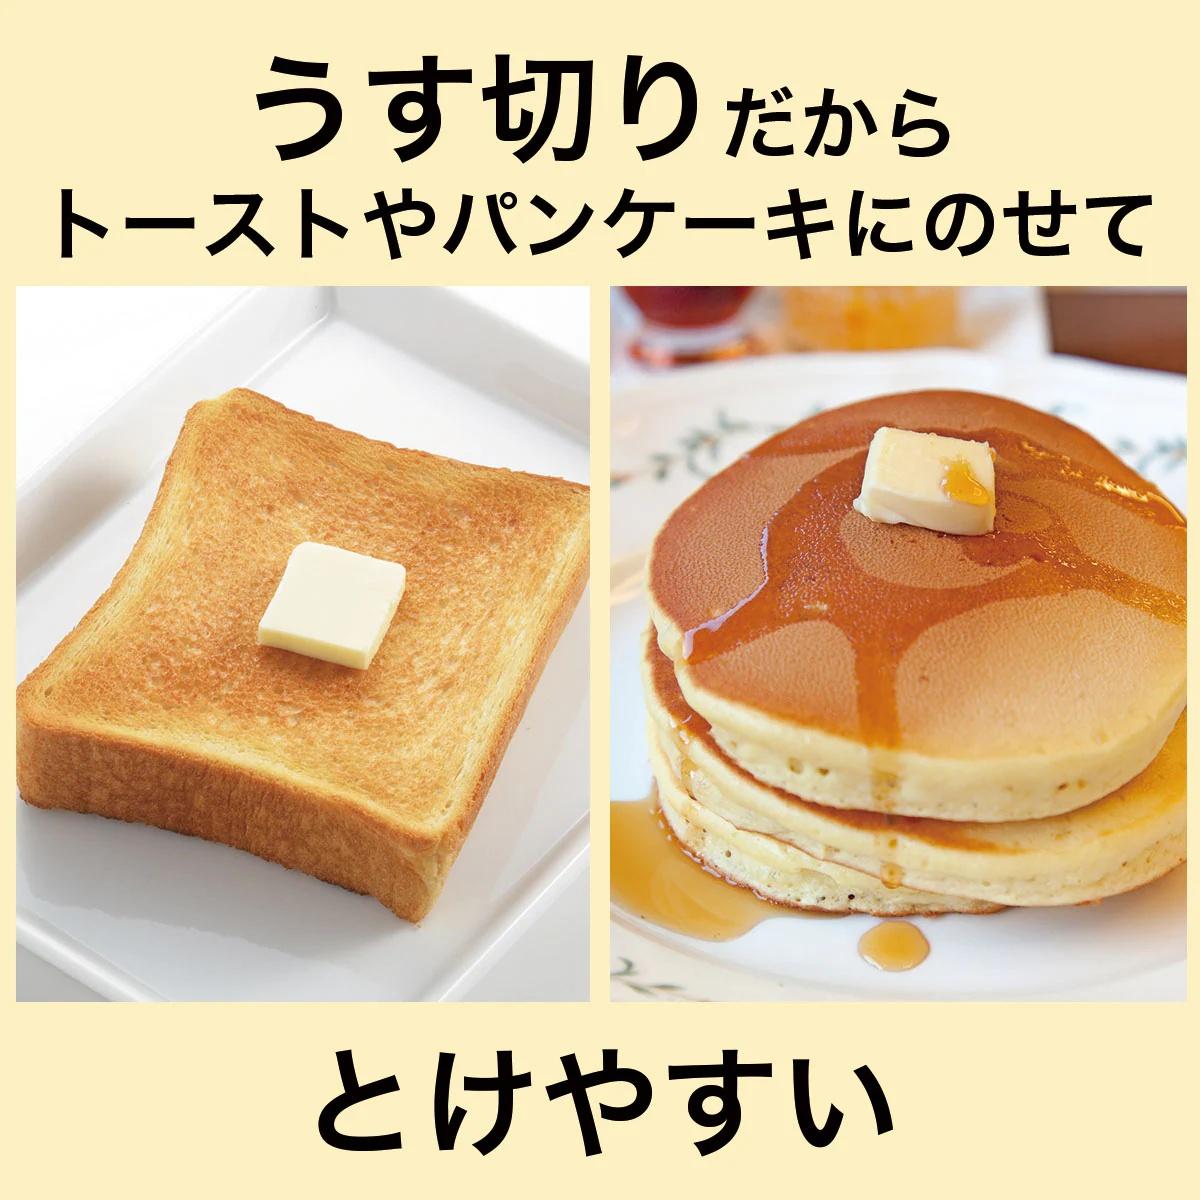 NITORI(ニトリ) バターケースの商品画像6